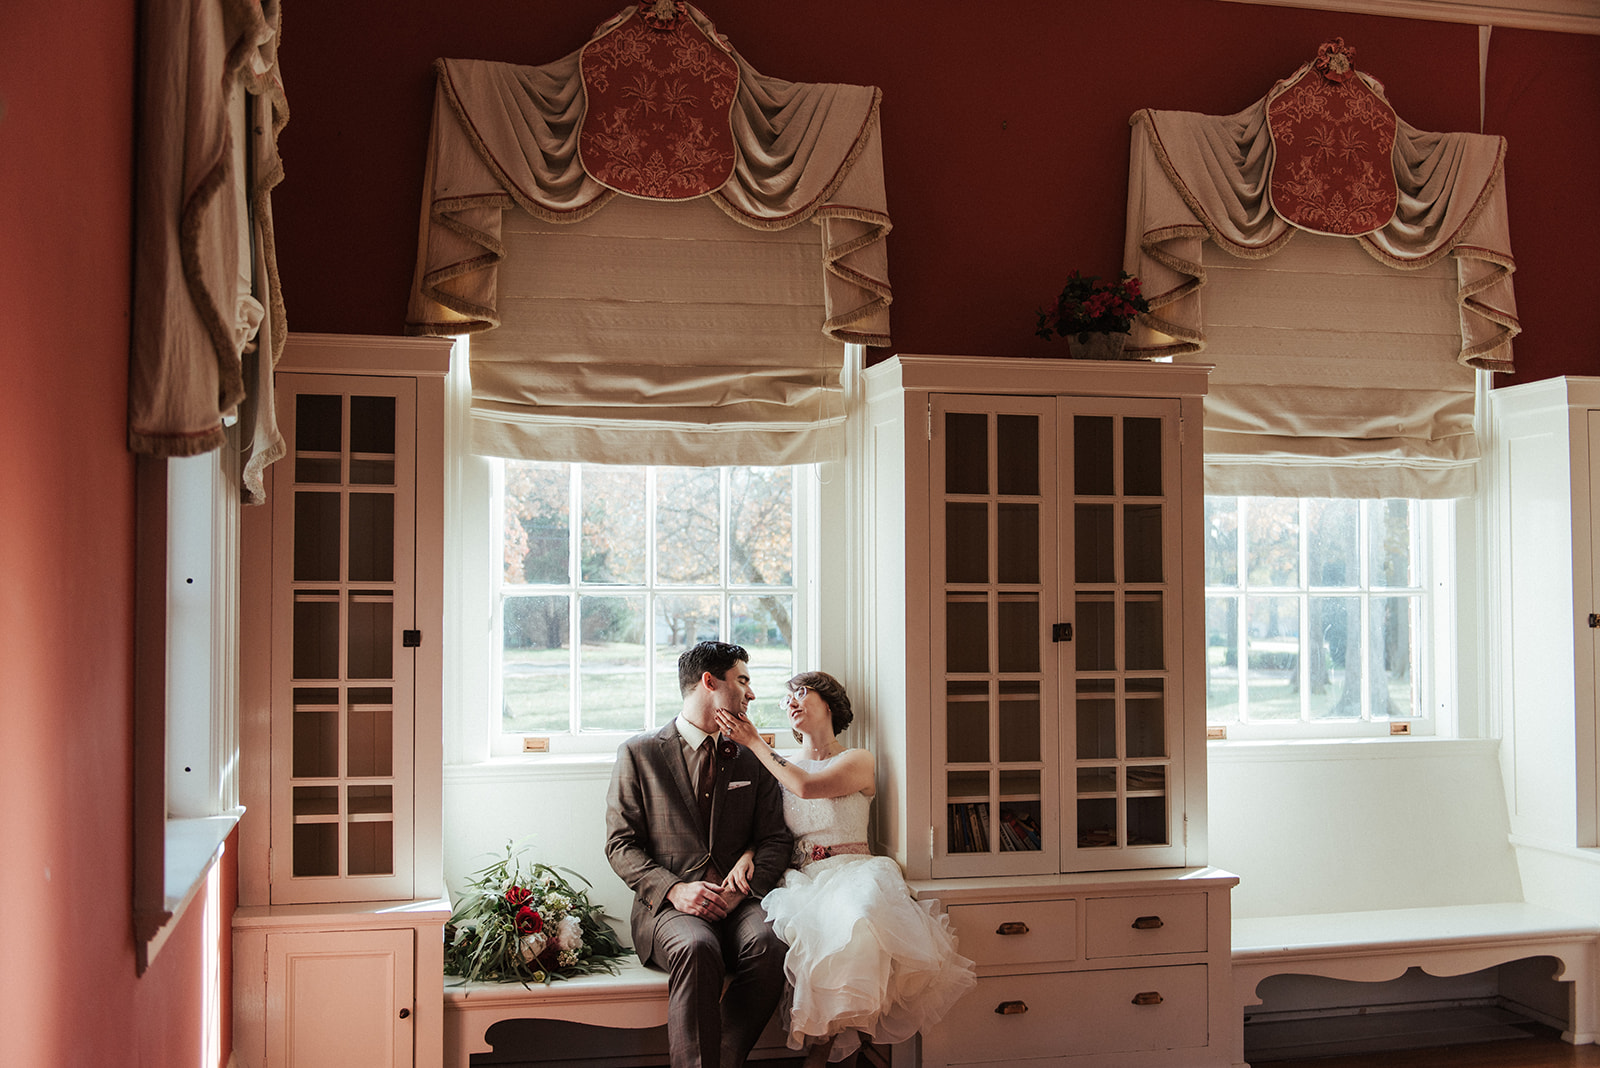 stowe manor wedding photographer